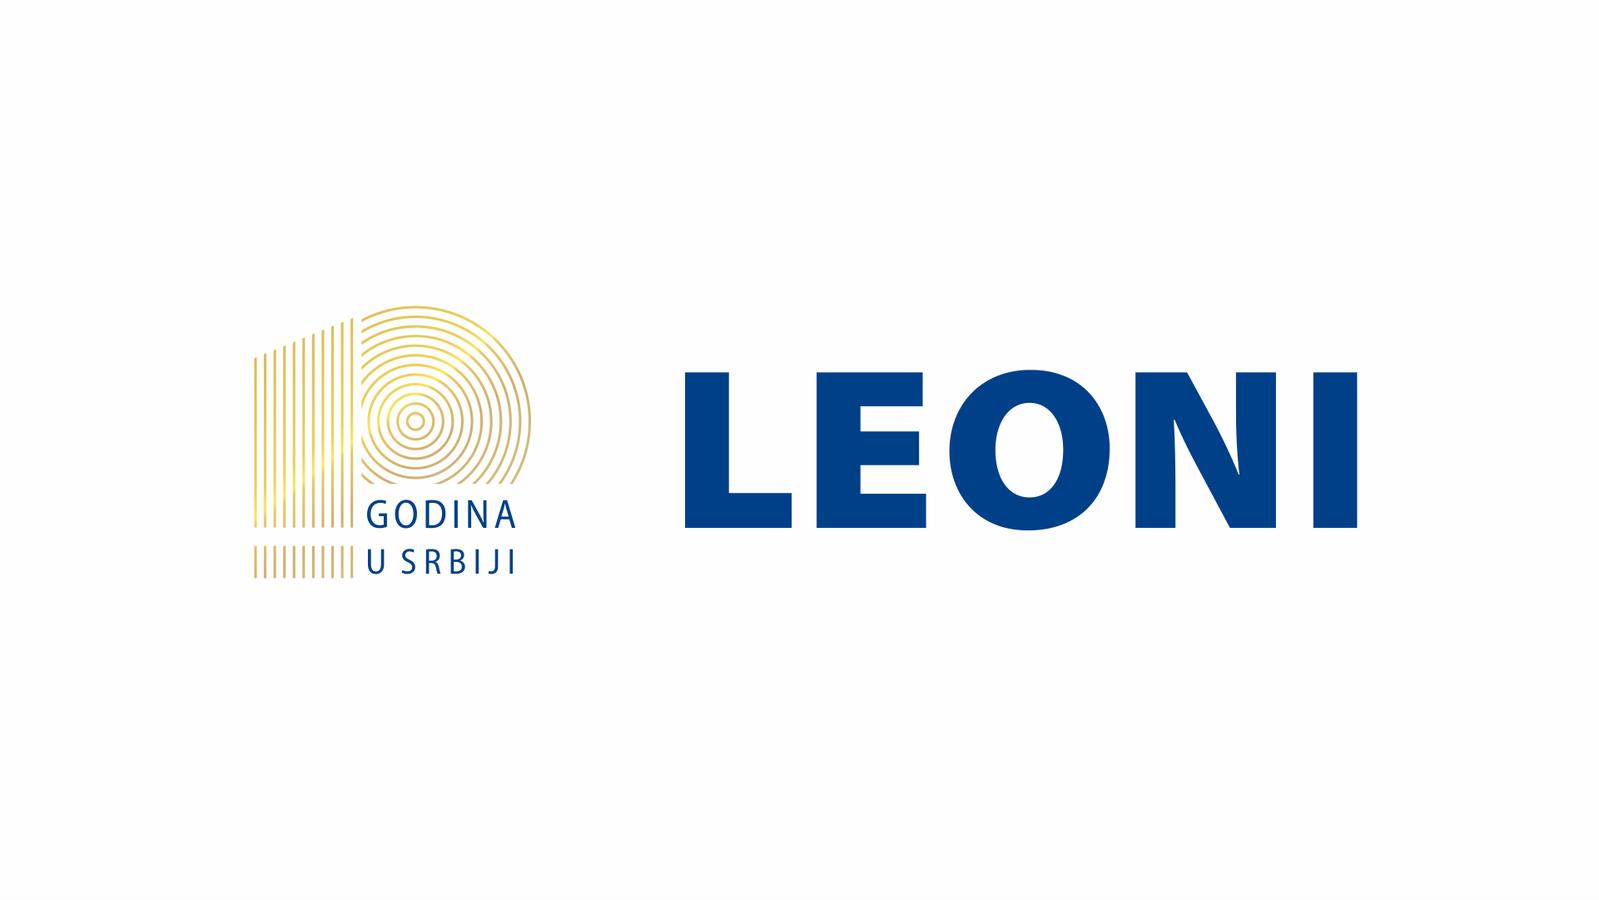 Leoni Wiring Systems Southeast d.o.o.-logo